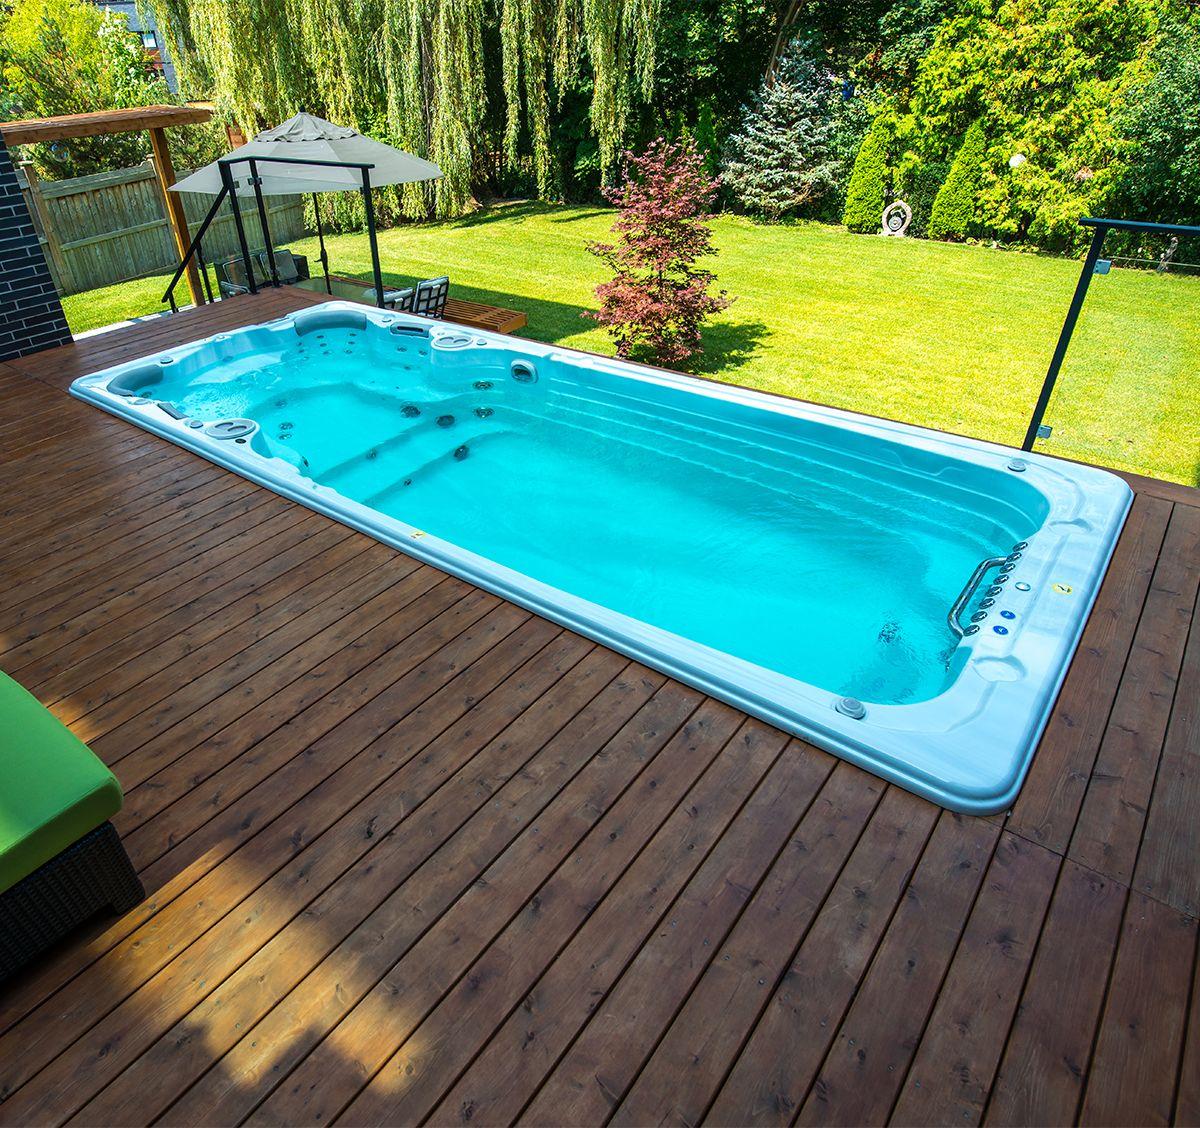 Swim Spas Durham Hot Tub Pool Supply Store Swim Spa Landscaping Backyard Pool Endless Pool